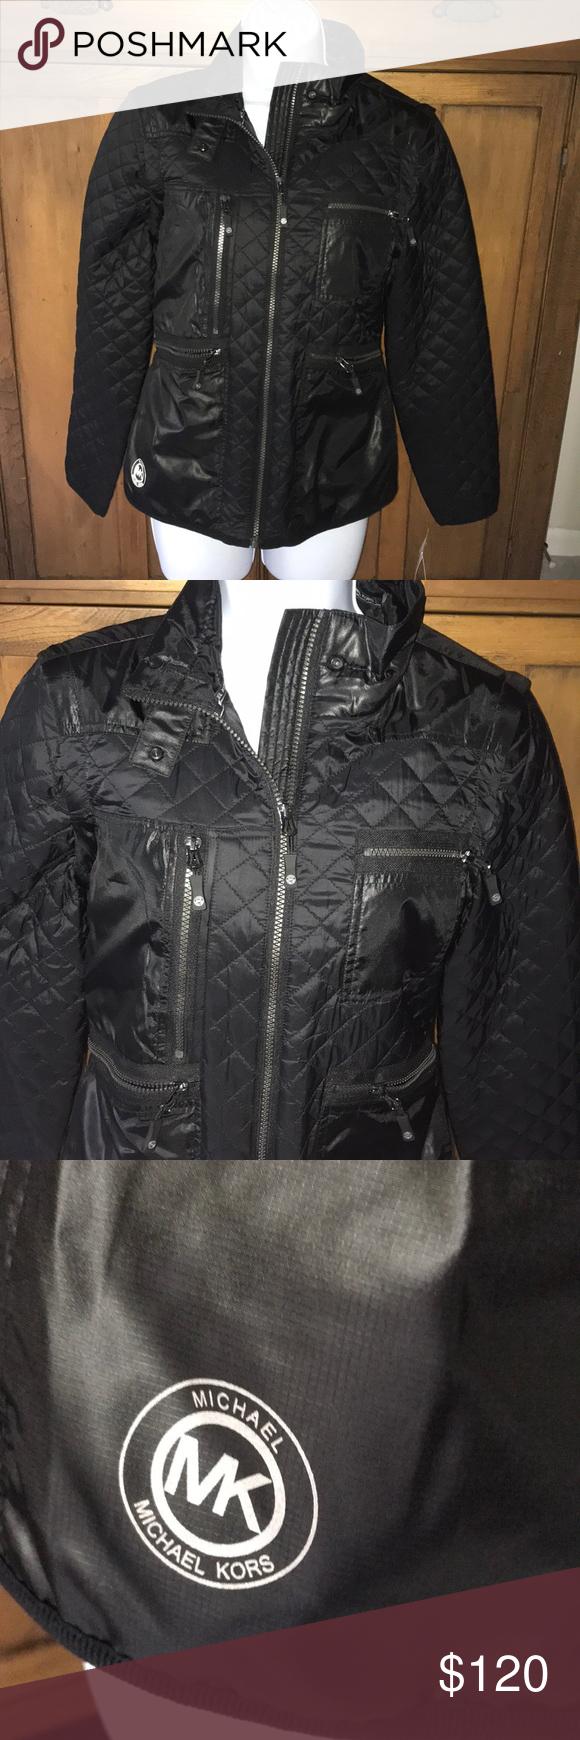 Nwt Blck Michael Kors Jacket W Removable Sleeves Michael Kors Jackets Clothes Design Michael Kors [ 1740 x 580 Pixel ]